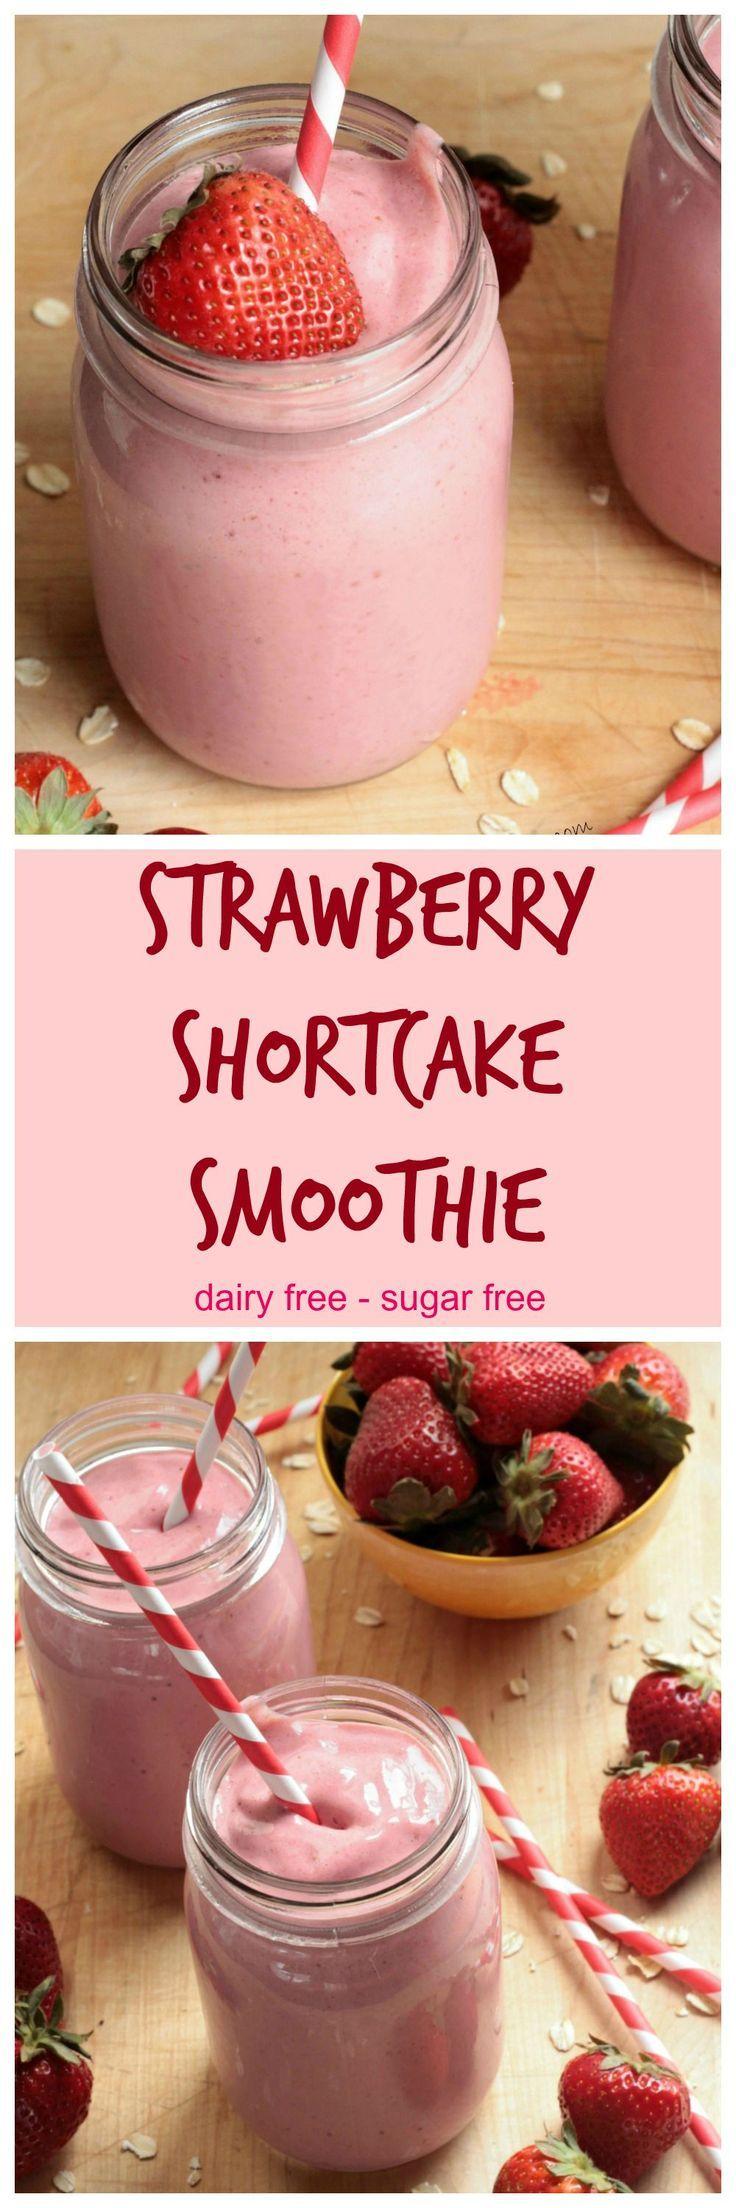 Healthy Strawberry Shortcake Smoothie, ____ calories: 1 C. frozen strawberries • 2/3 C. almond milk • 1 T. cashew butter • 2 dates • 1/3 tsp. vanilla extract • 1/3 tsp. cinnamon • 2 T. oats